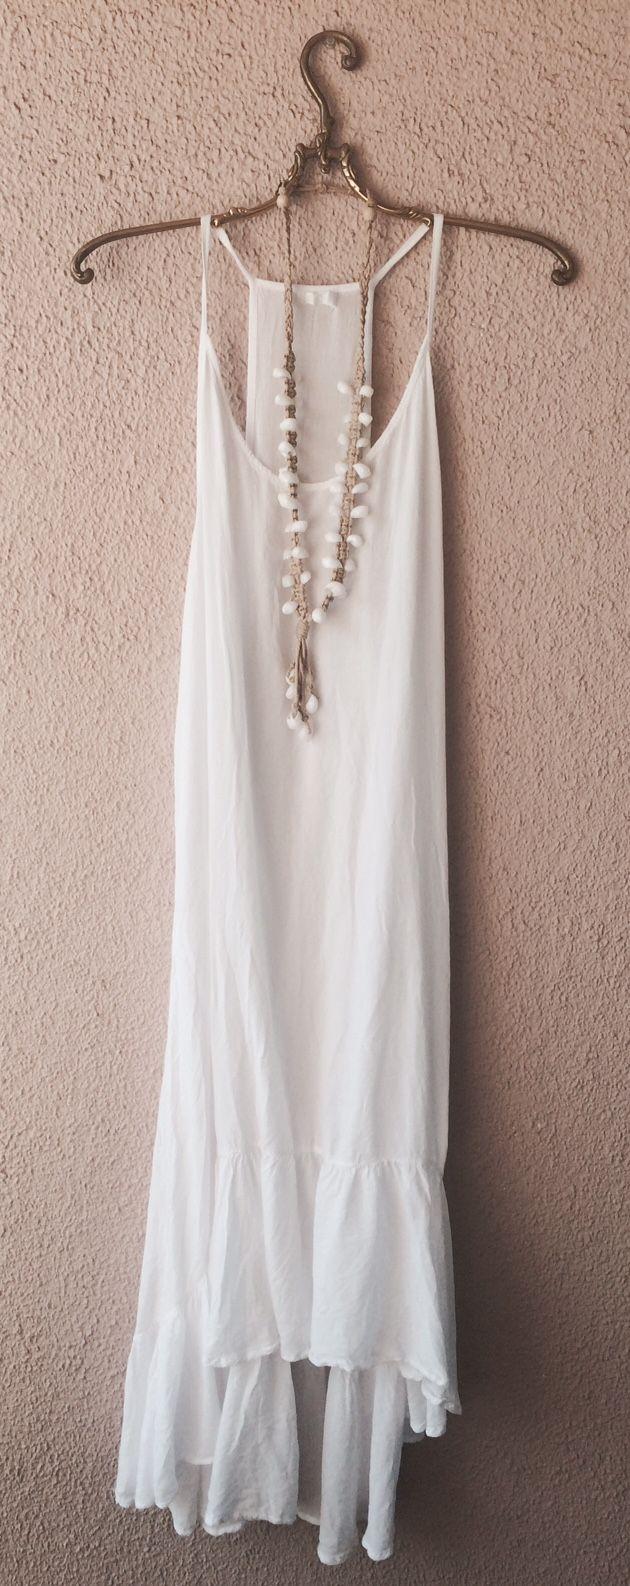 Indha white ruffle hi low bohemian beach resort or gypsy wedding